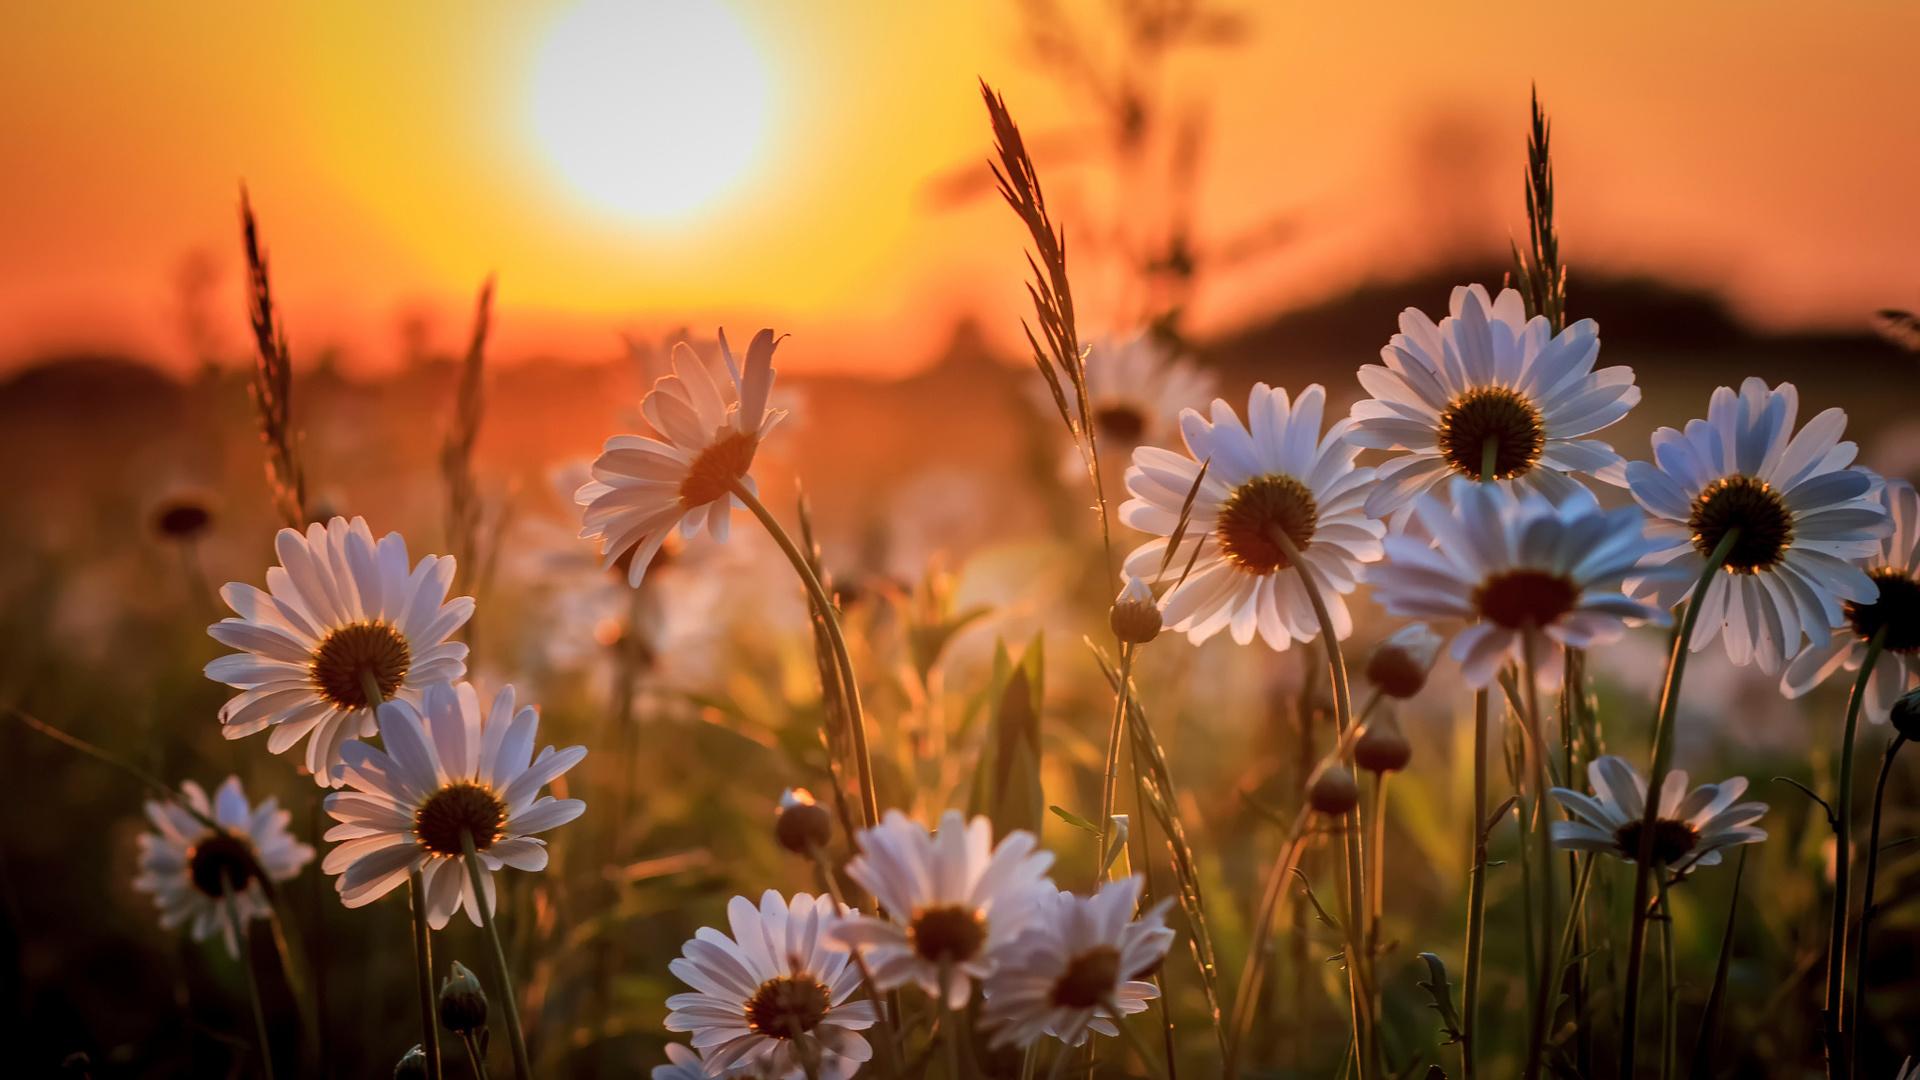 Картинки поле с цветами и солнце, картинки рентгенологи